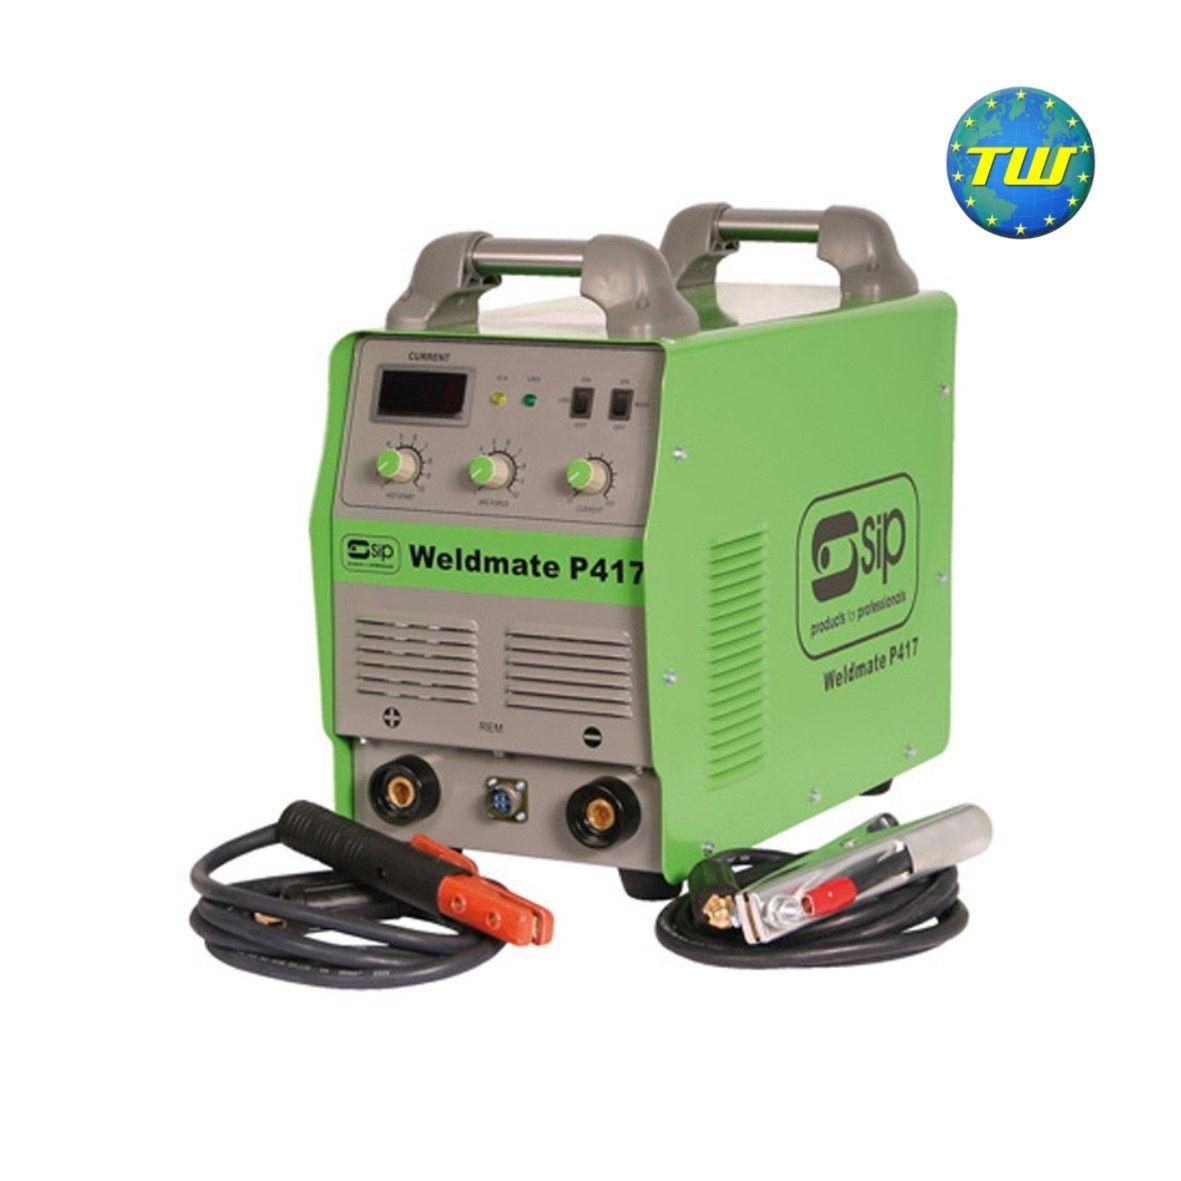 SIP 05254 Weldmate P417 390 Amp 3 Phase Arc Inverter